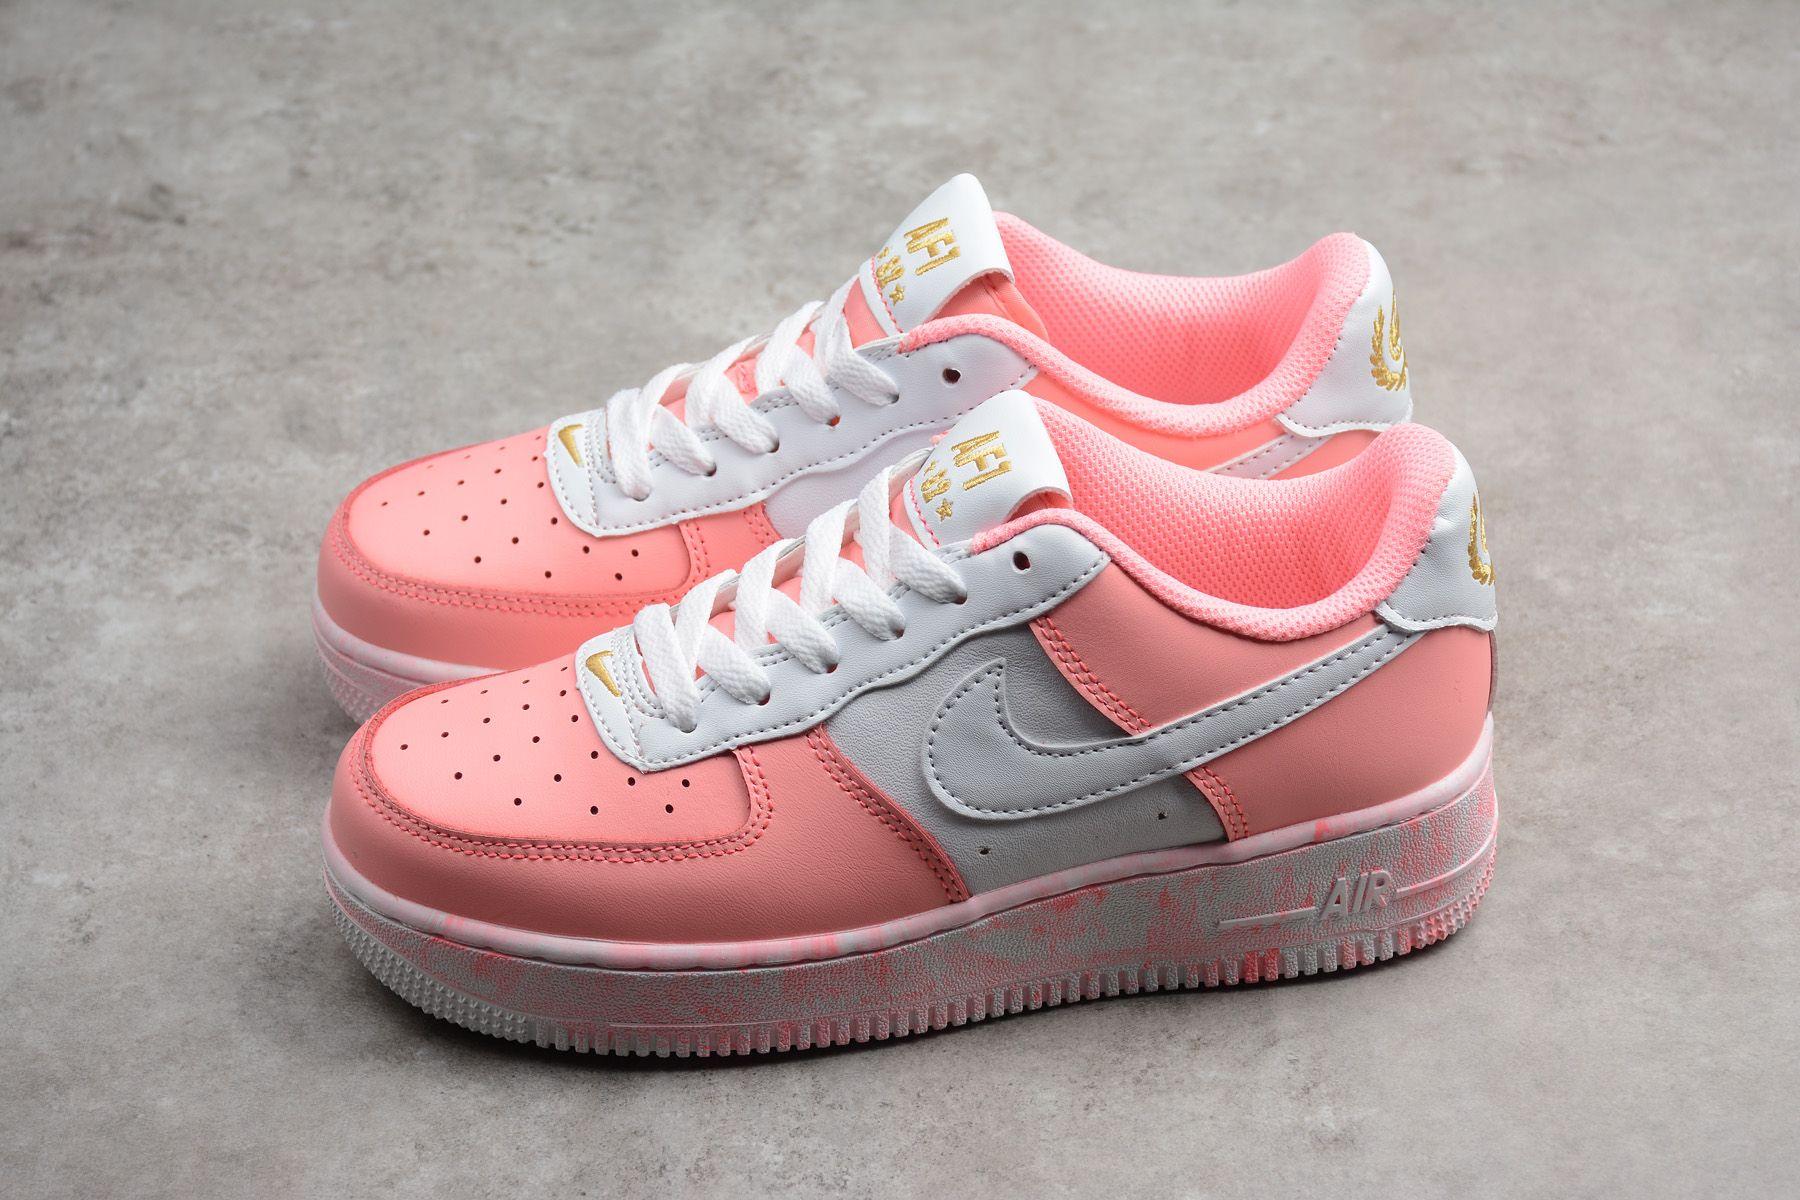 Nike Air 1 für Force WhiteSchuhe 65 Sneaker Upstep Pink SqUGzVLMp